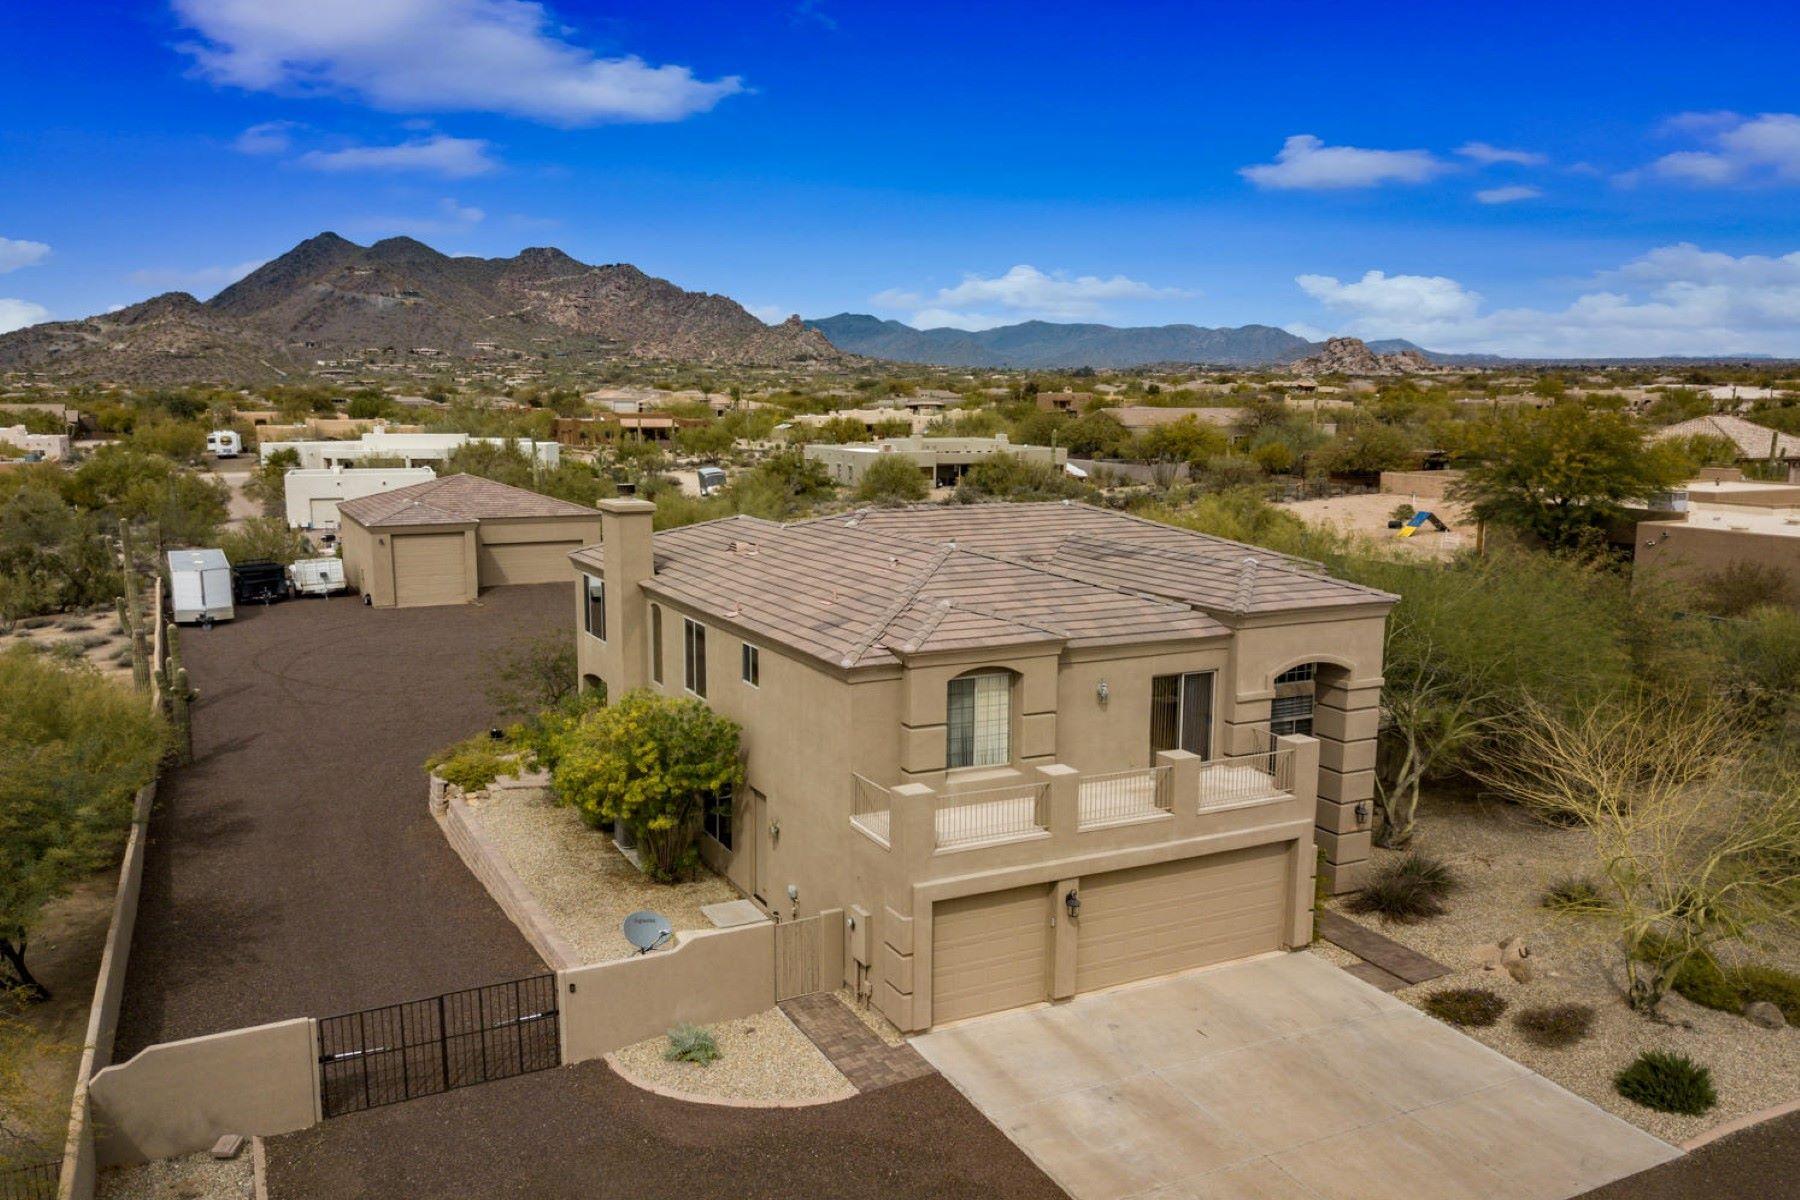 Частный односемейный дом для того Продажа на Scottsdale Home With Awesome Black Mountain Views 6318 E Dove Valley Rd, Cave Creek, Аризона, 85331 Соединенные Штаты